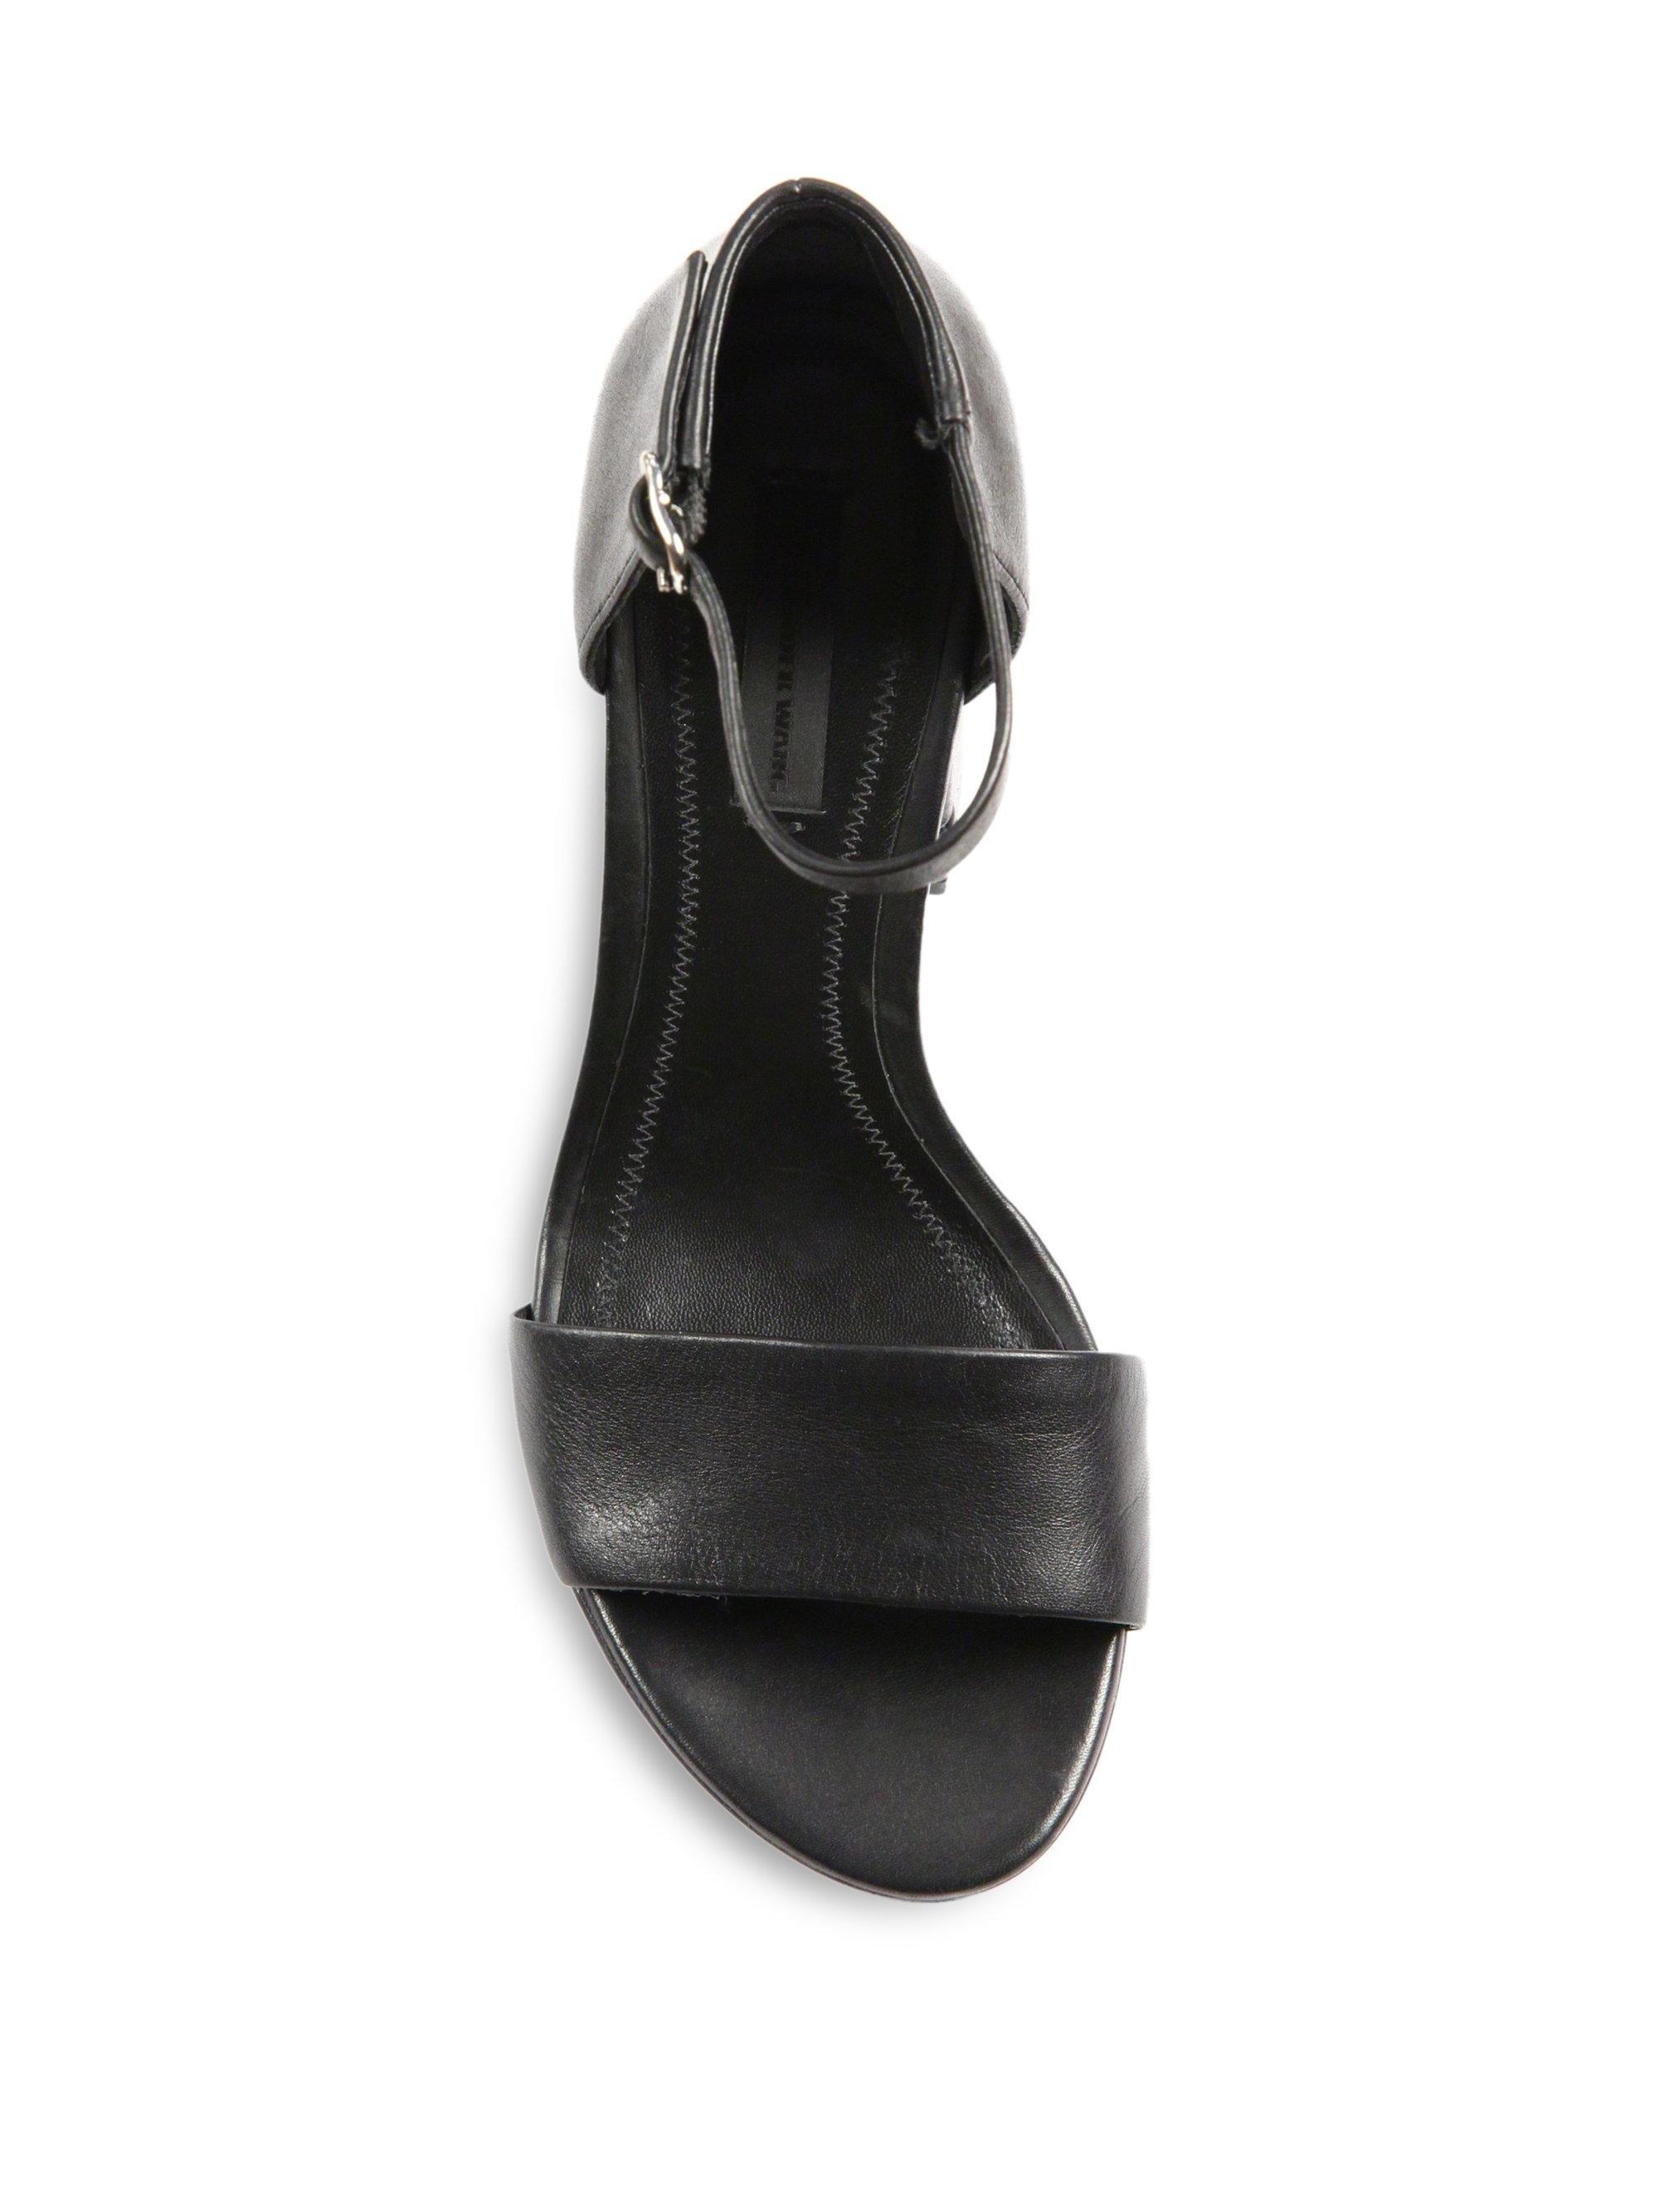 ef756253c0c Alexander Wang Women s Abby Tilt-heel Leather Ankle-strap Sandals - Black -  Size 37 (7) in Black - Save 55.96658711217184% - Lyst